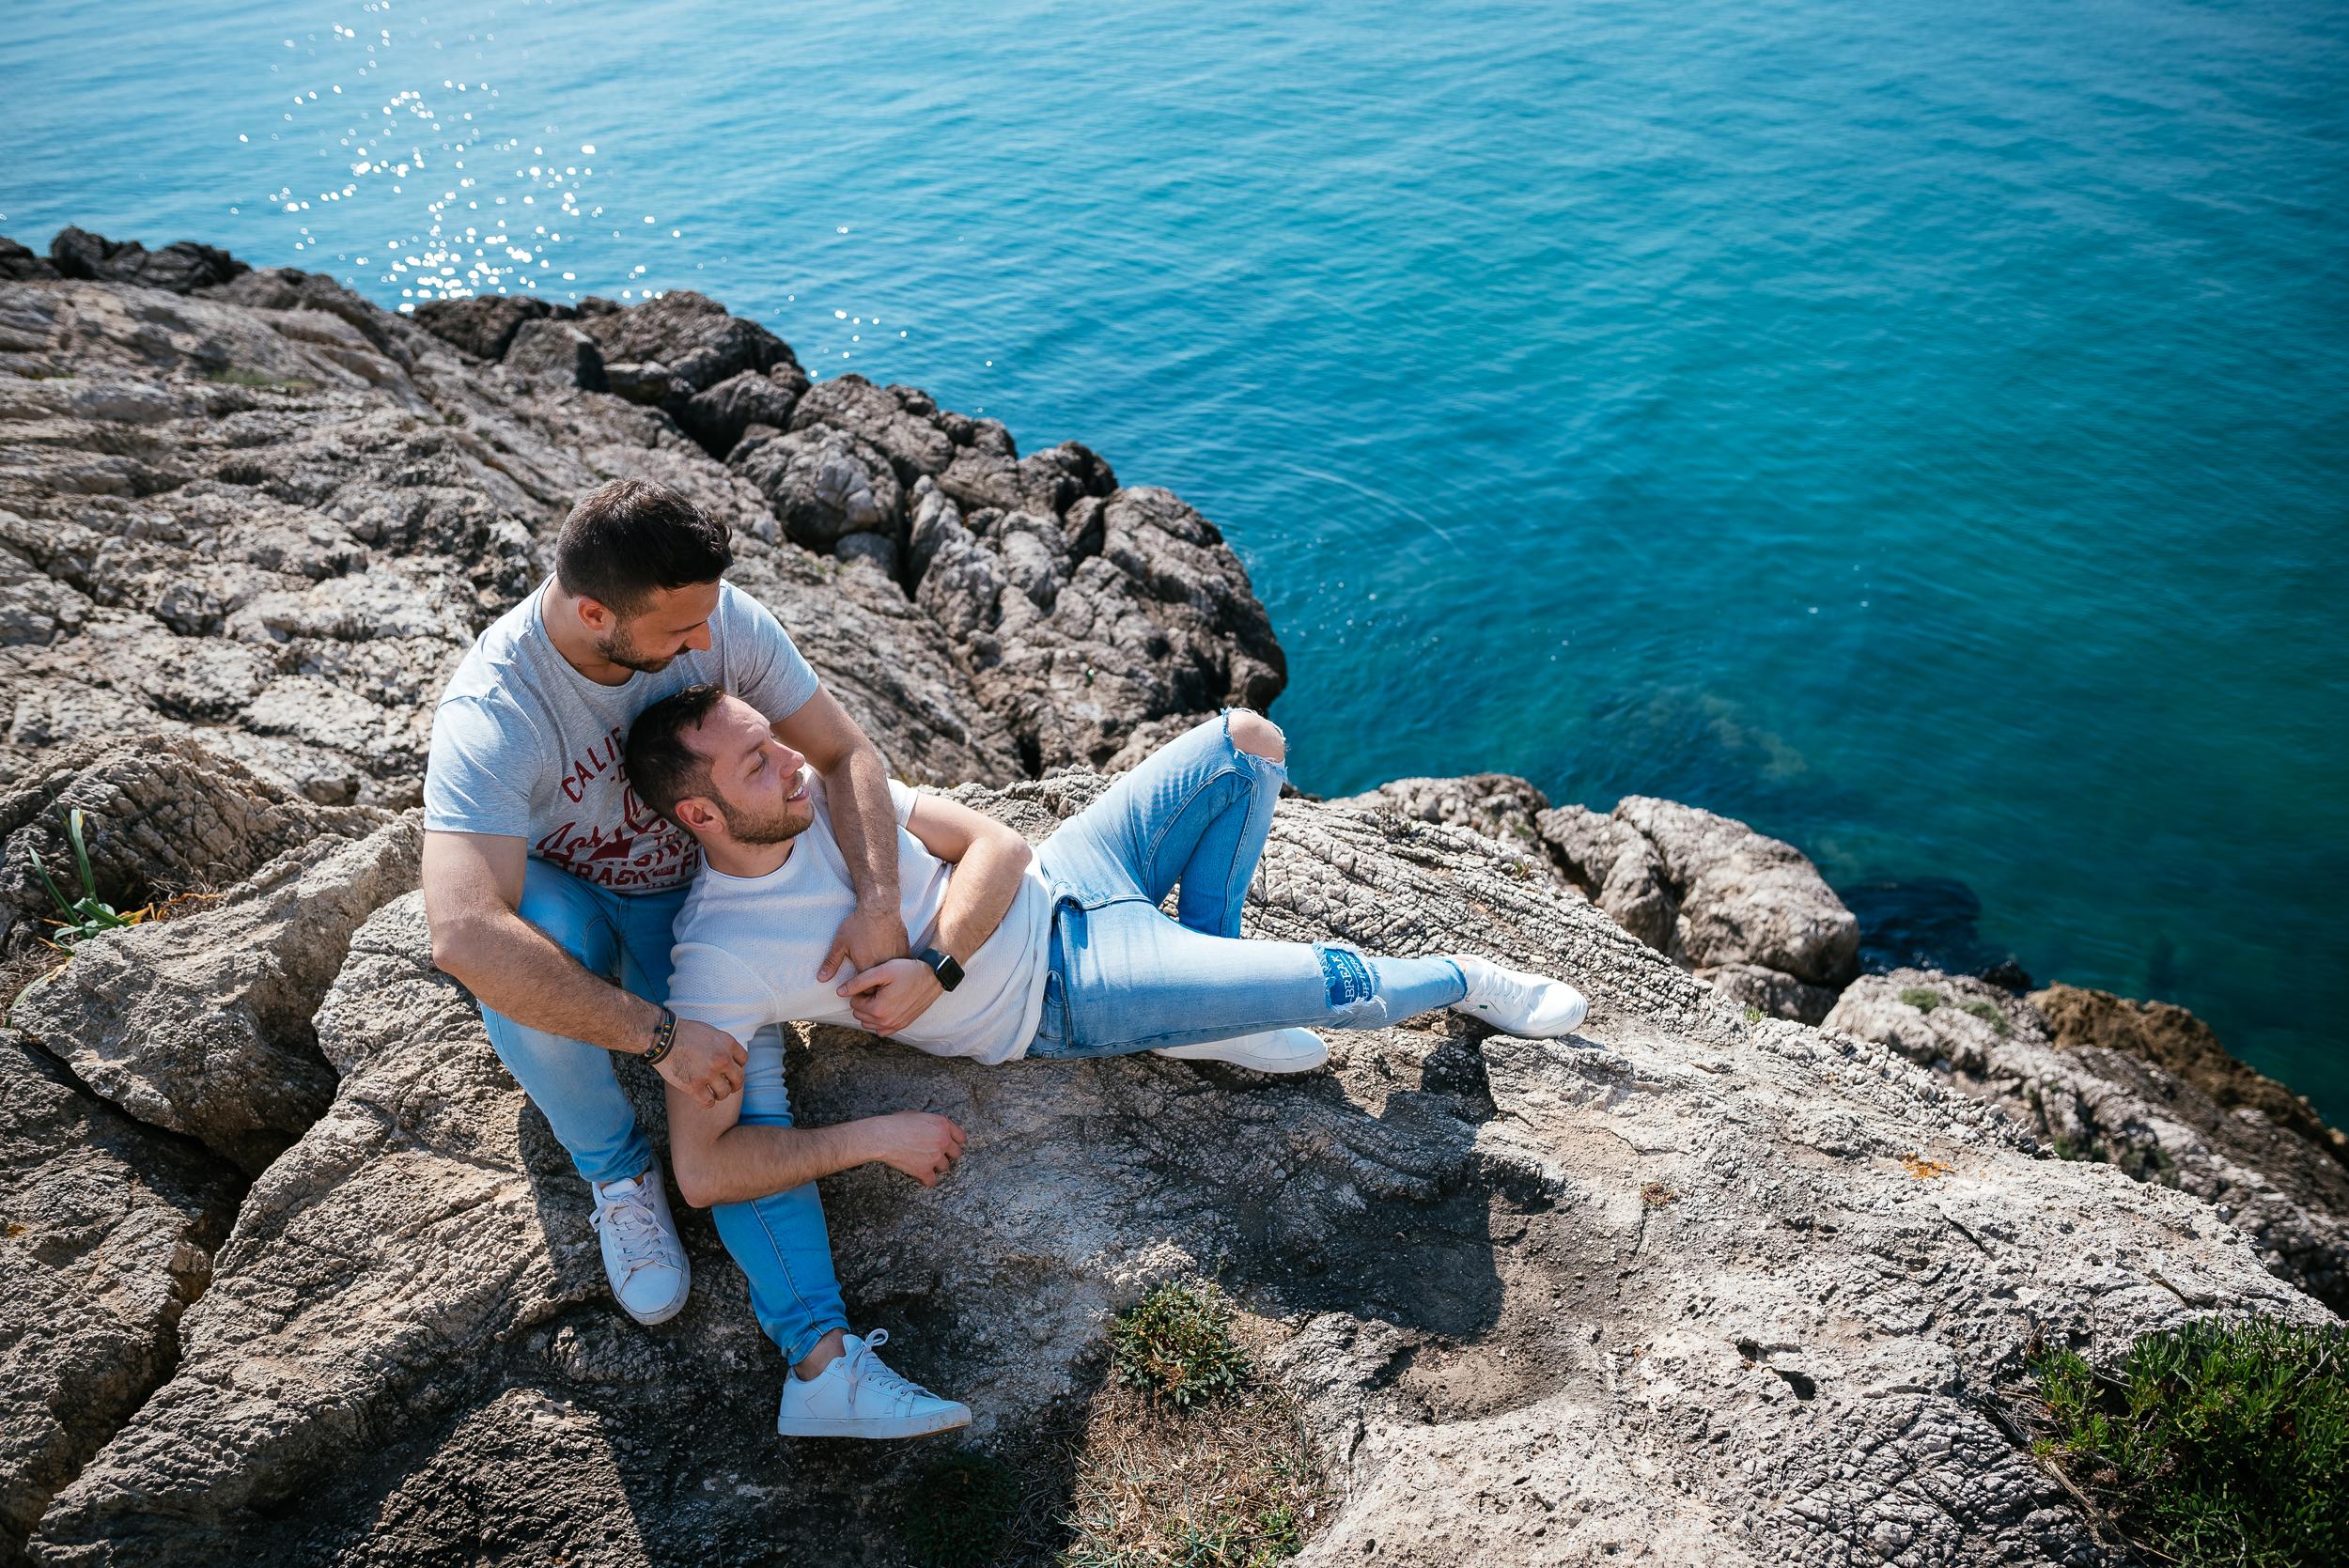 engagement-matrimonio-latina-giuseppe-deangelis-4